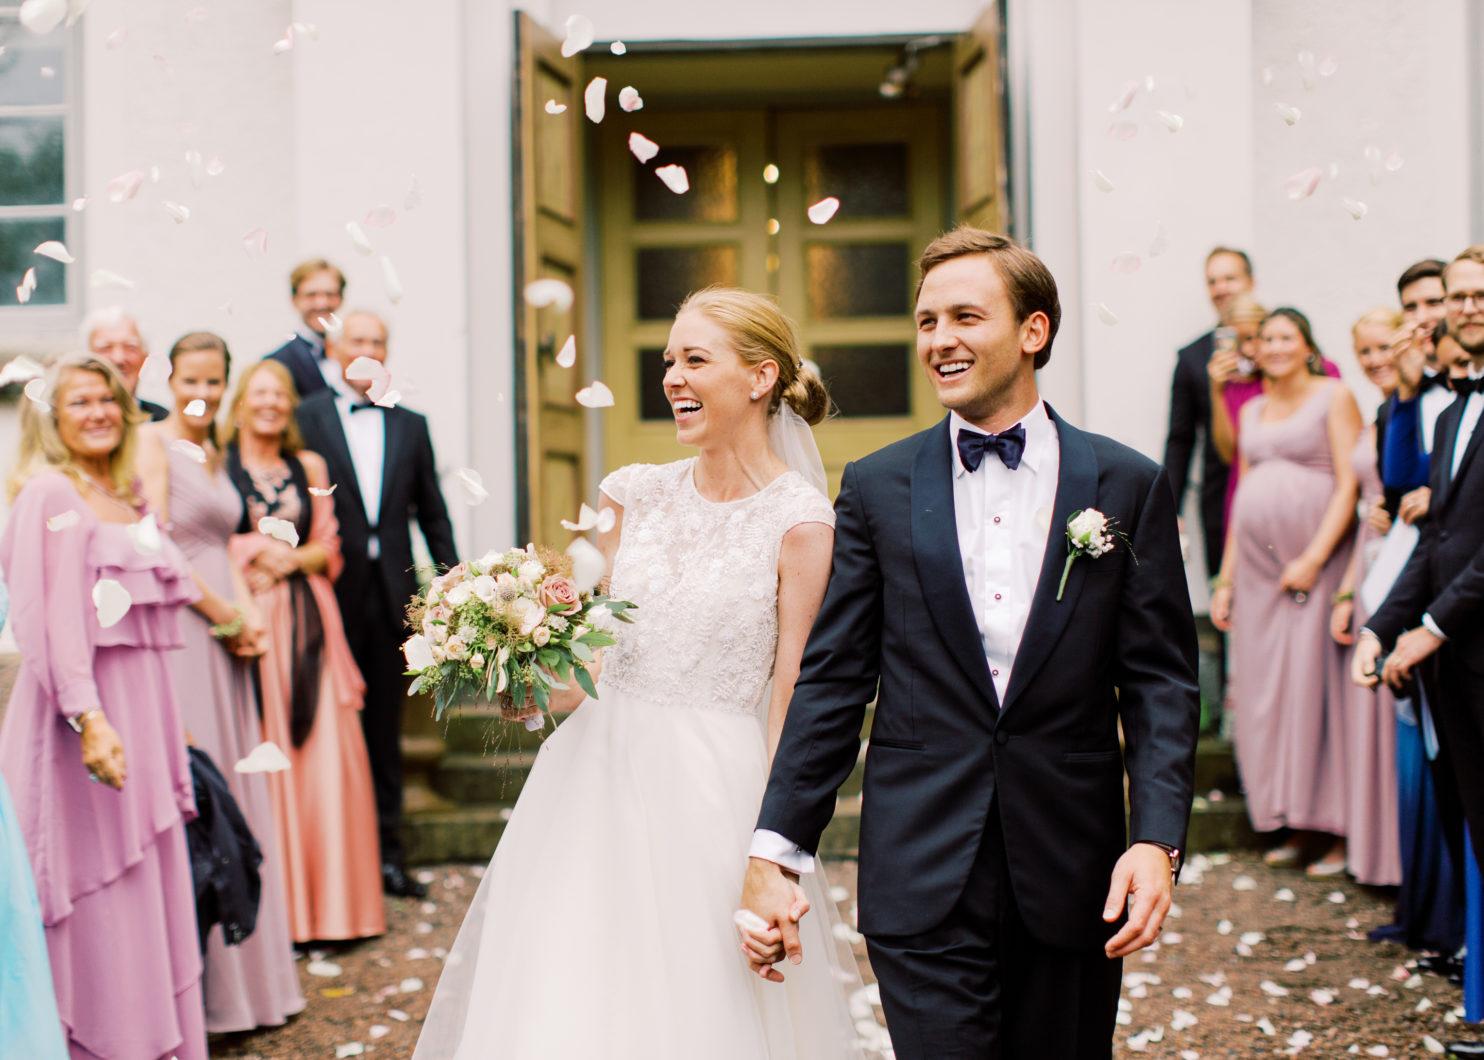 Fotograf-Eline-Jacobine-Wedding-Bjertorp-slott-1-2